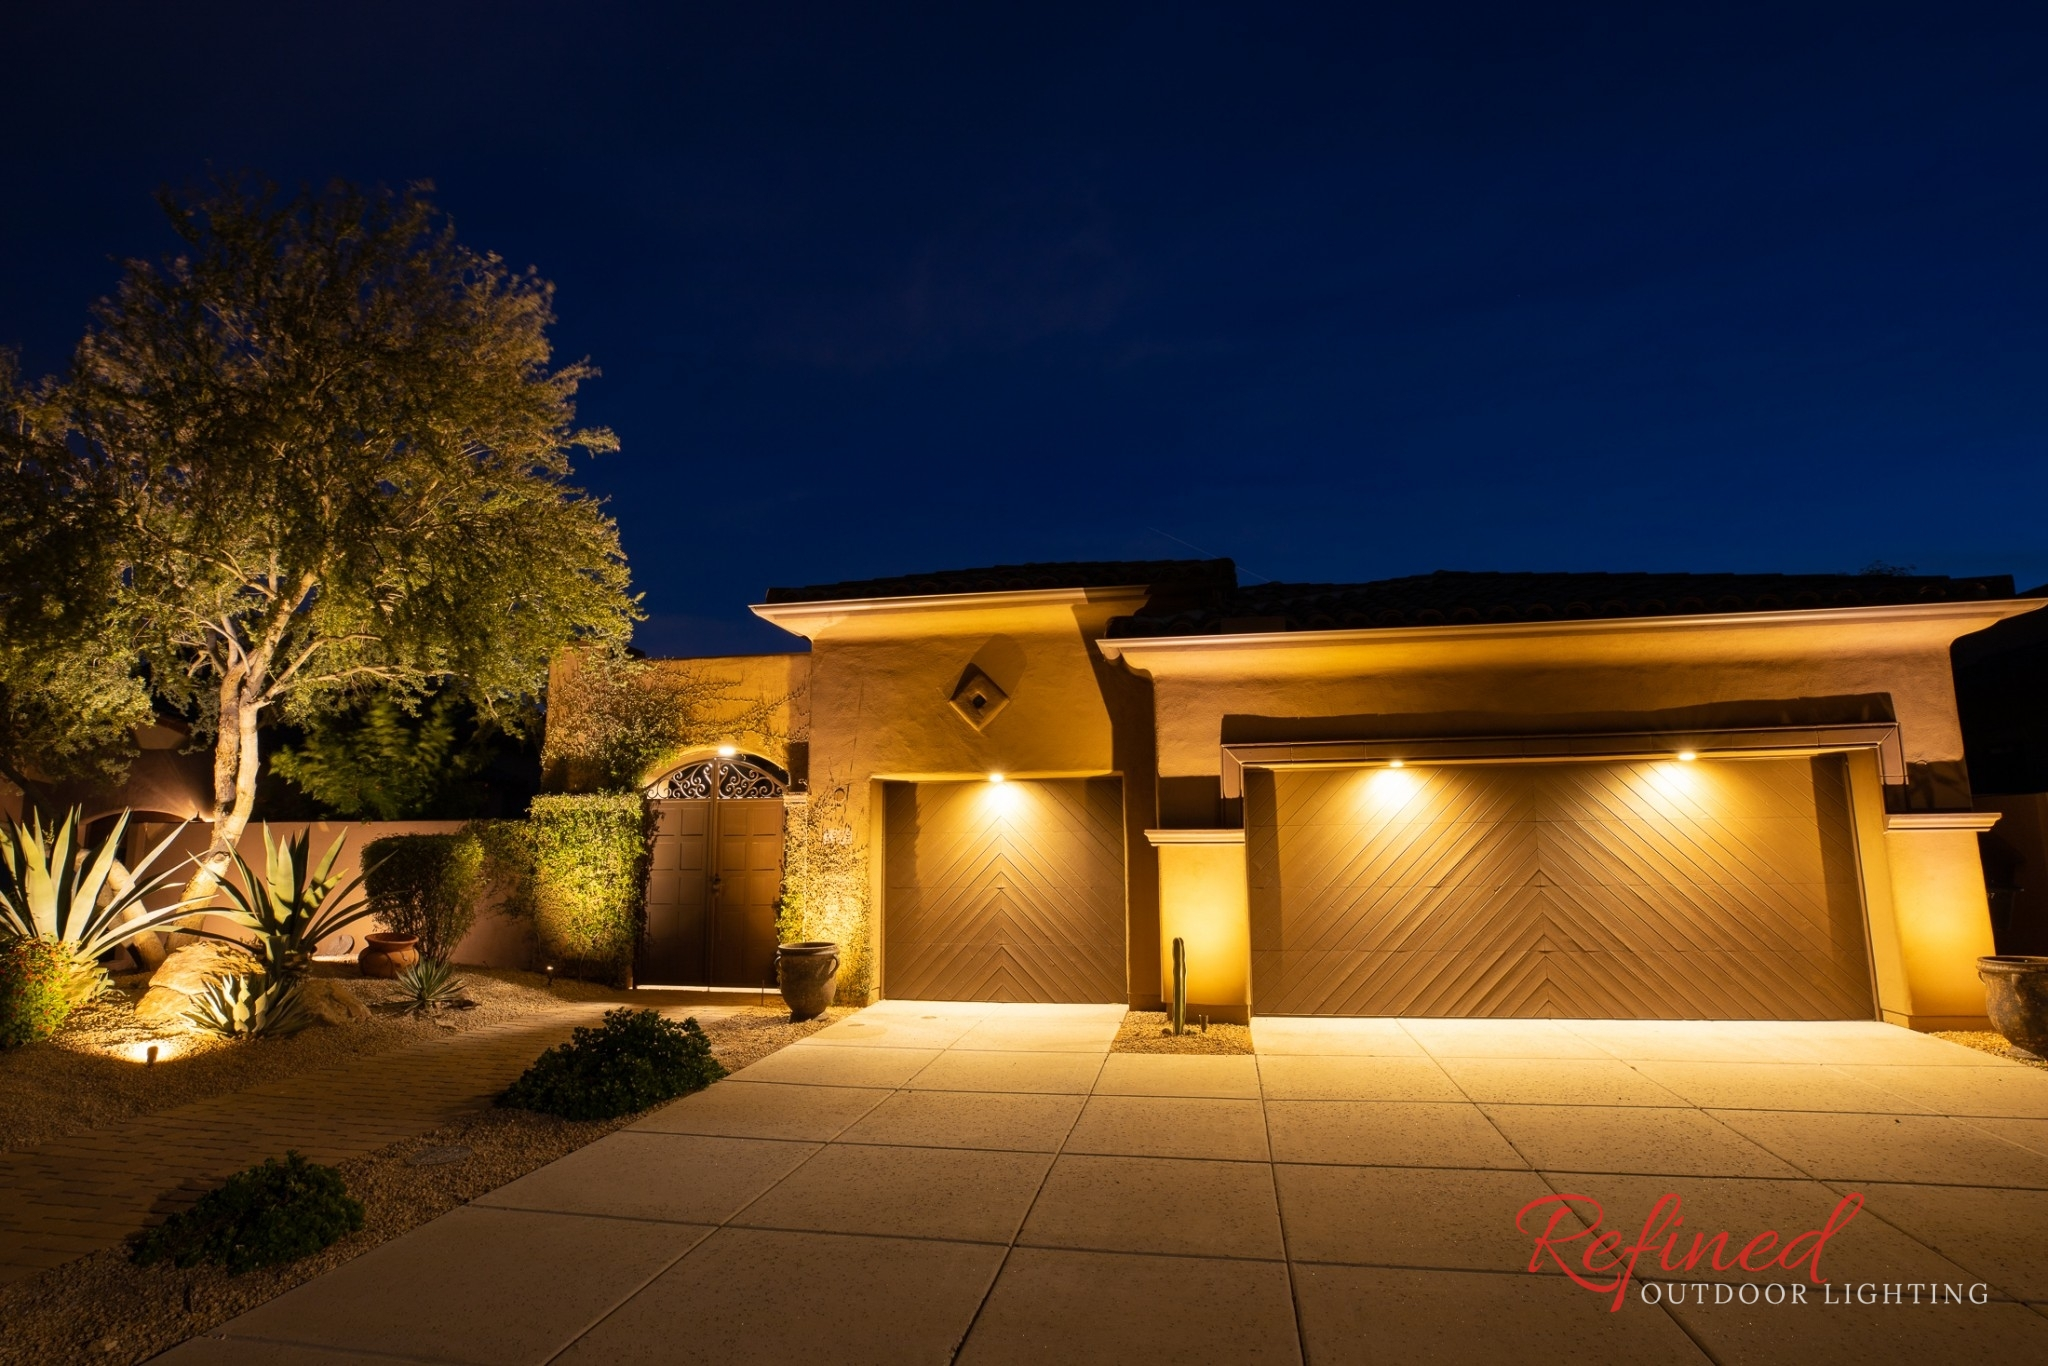 Landscape Lighting Gallery Refined